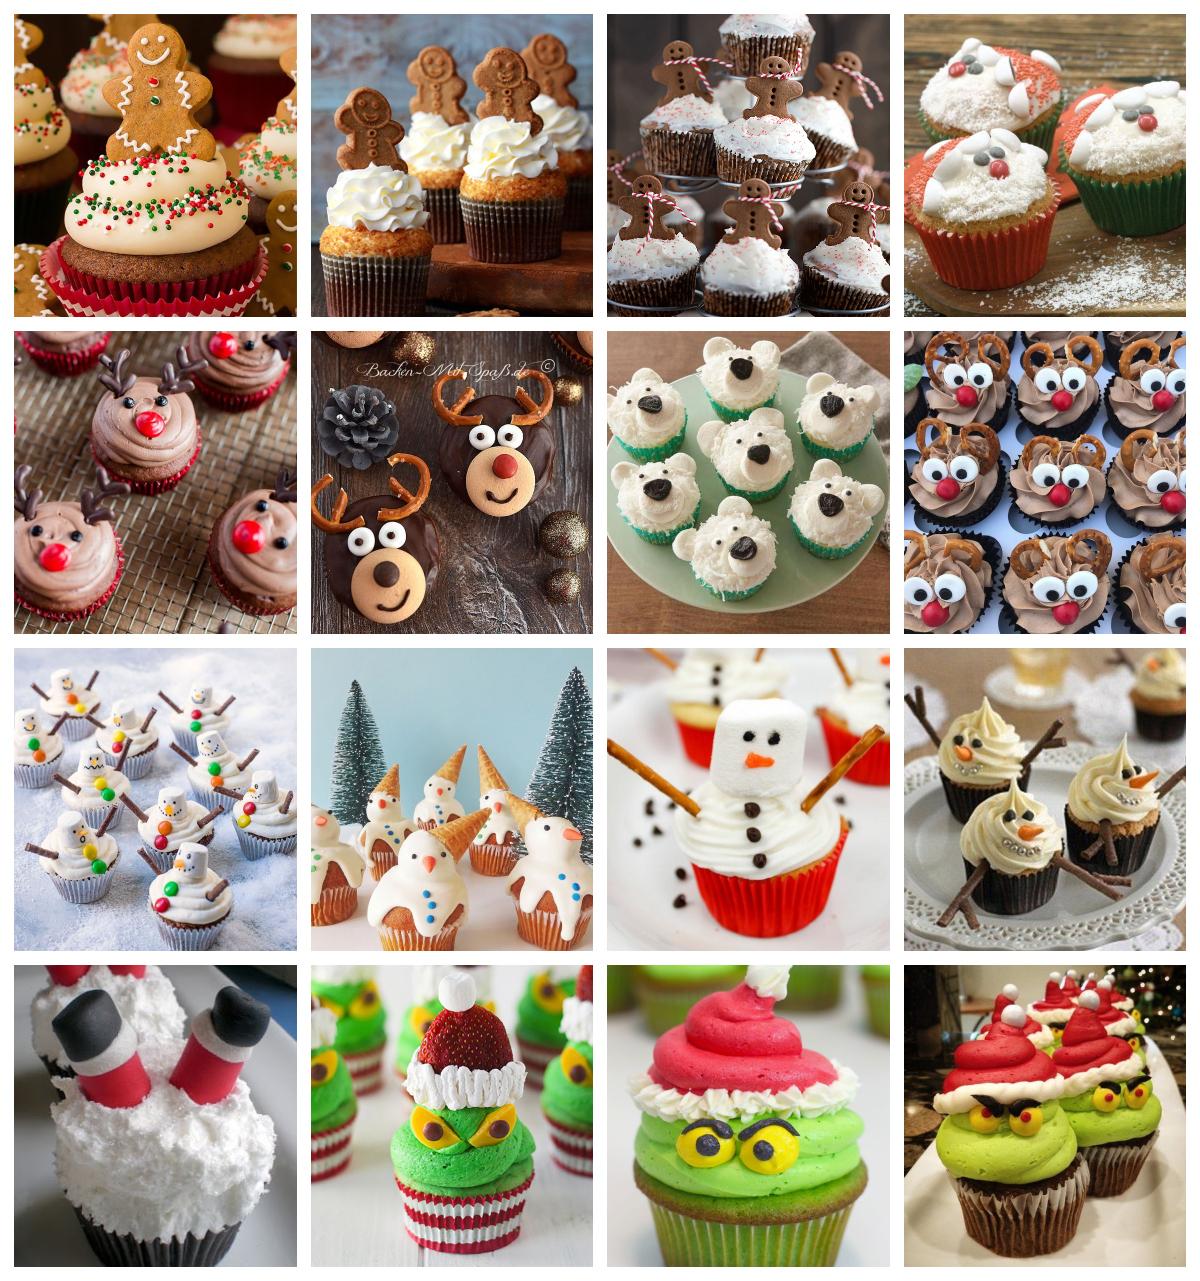 mezeskalacs_muffin_cupcake_sutemeny_diszites_dekoracio_karacsonyi_sutemeny_suti_desszert_otlet_2.jpg